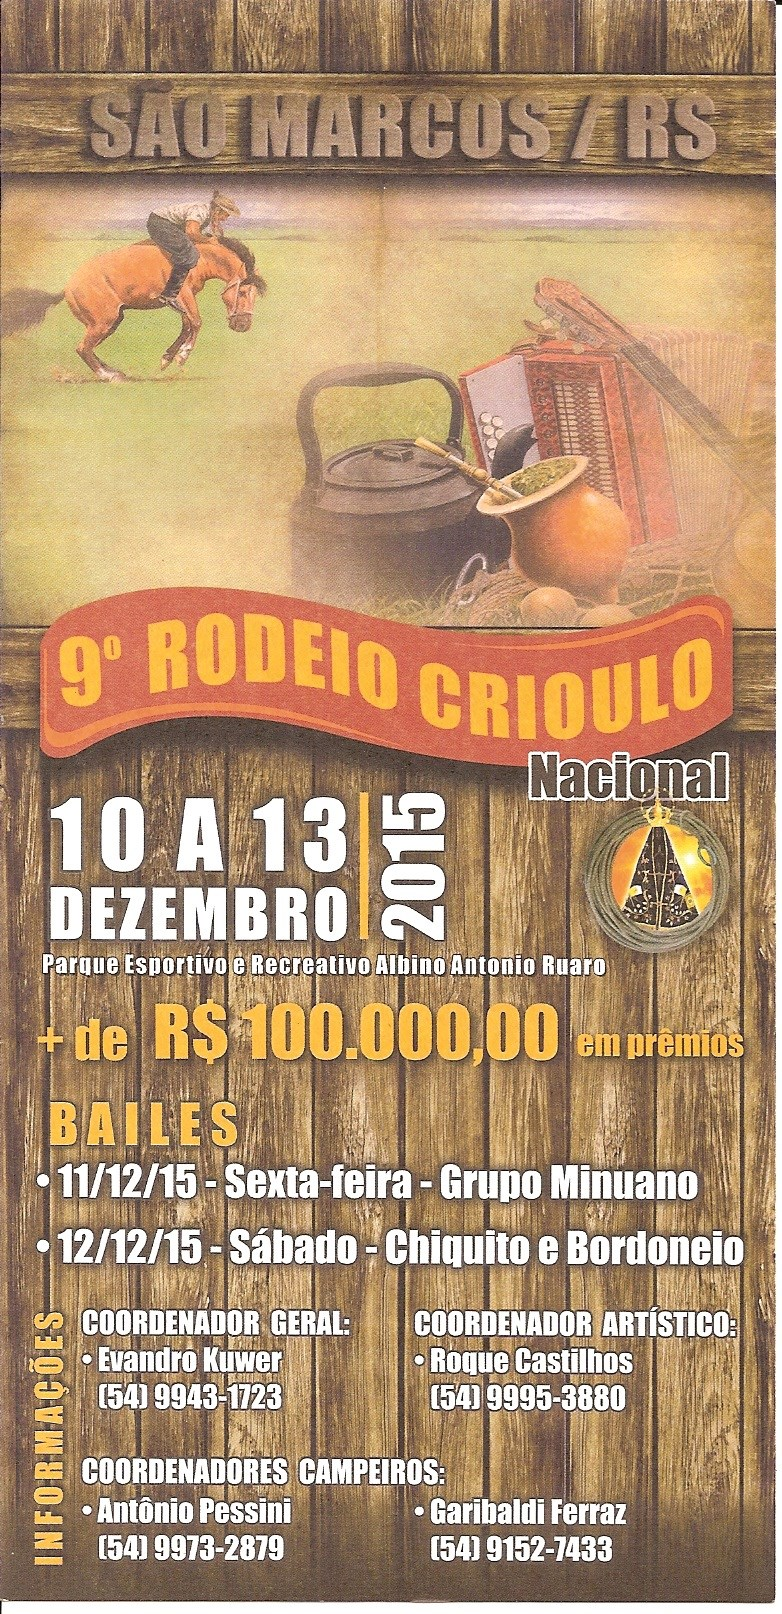 RodeioSaoMarcos